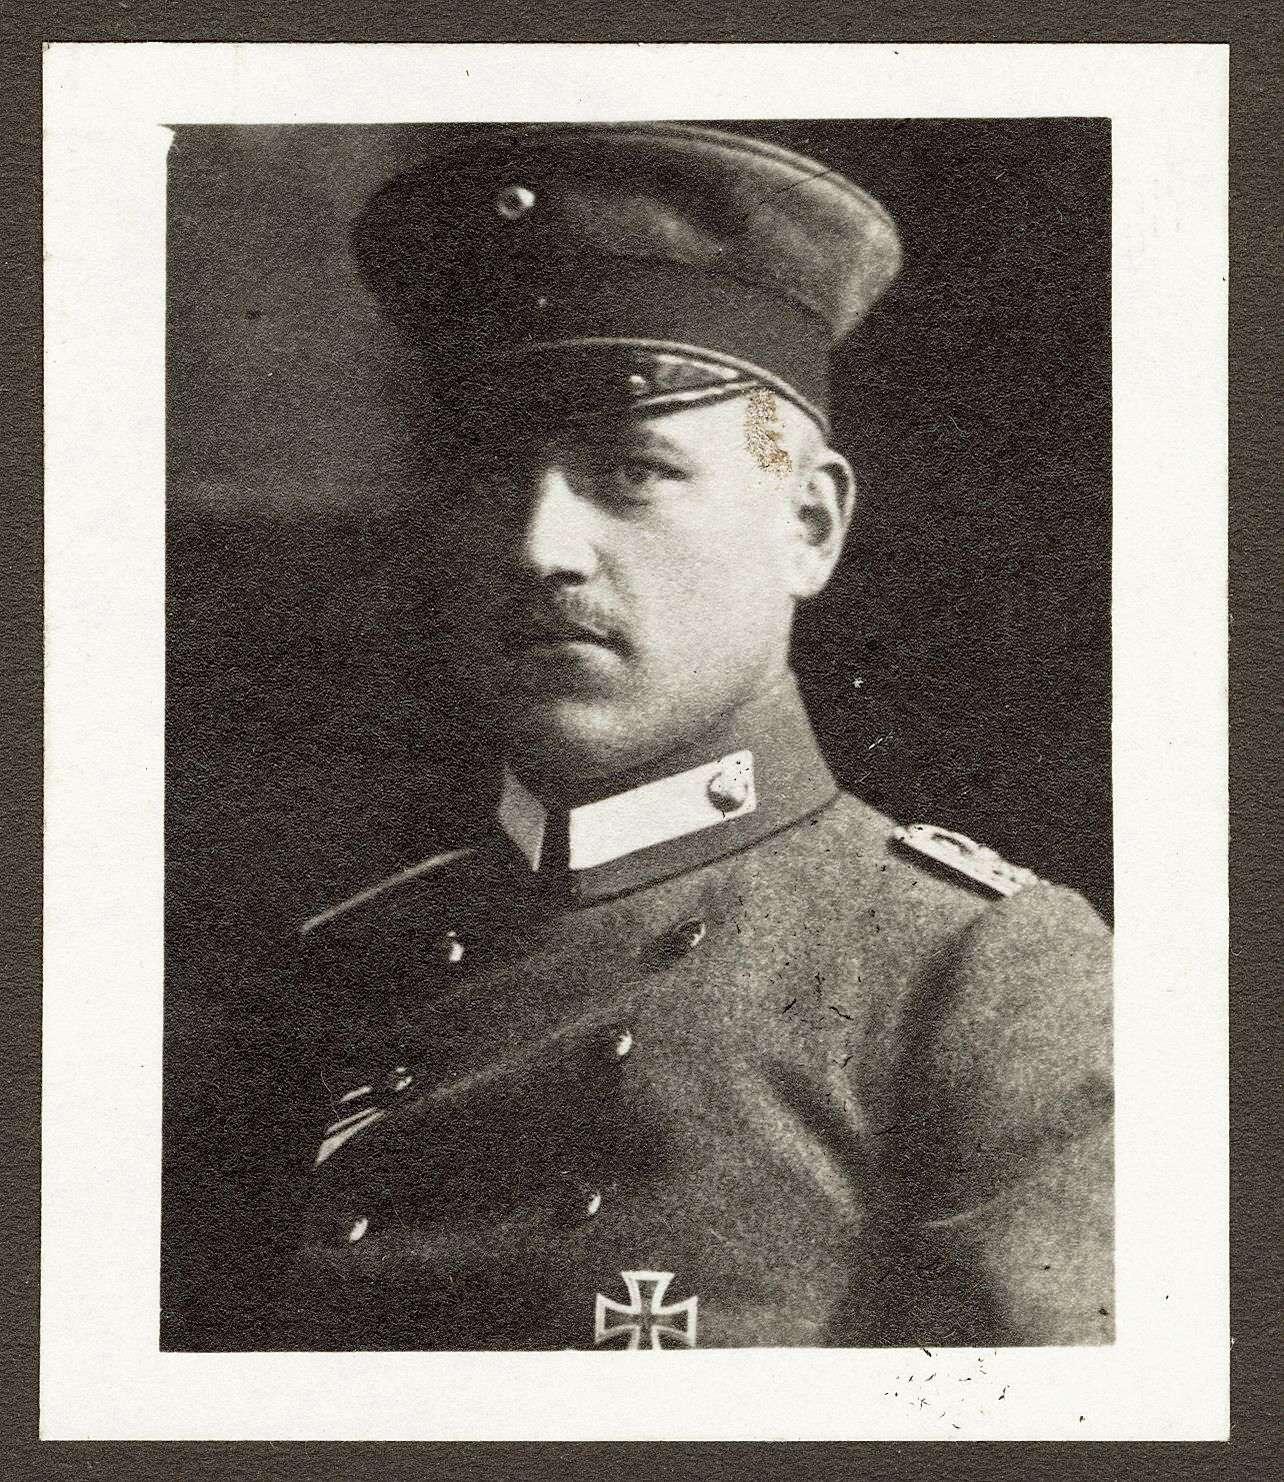 Krattenmacher, Alfons Mainrad, Bild 1